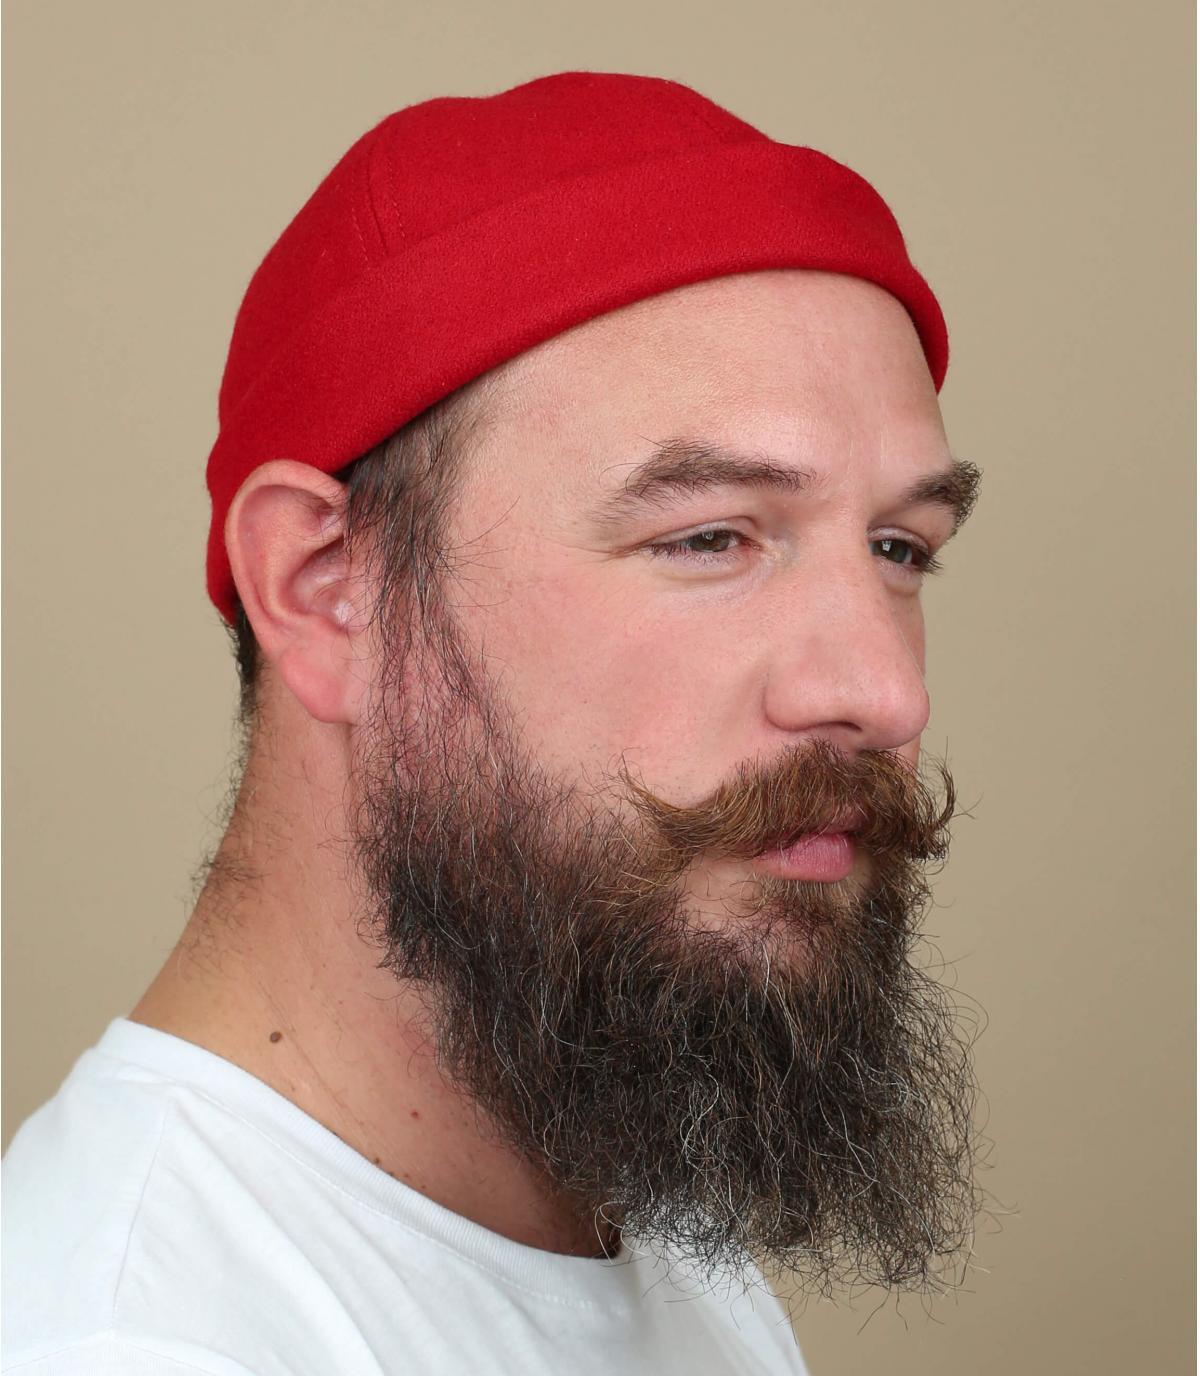 cappello rosso docker